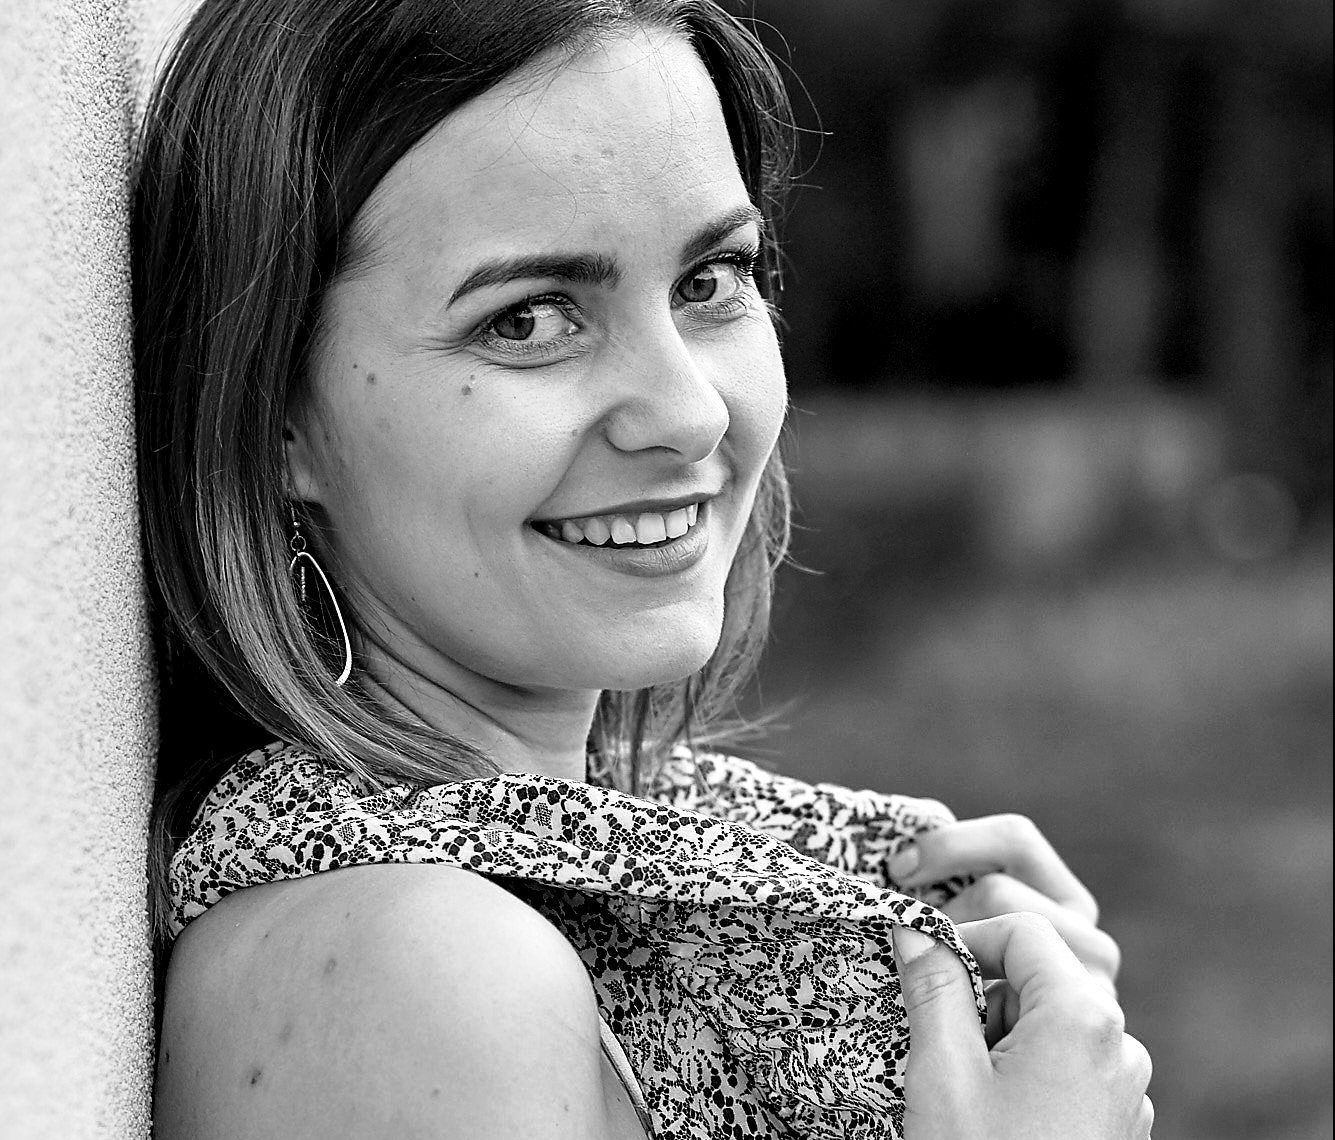 Anna Suchecka